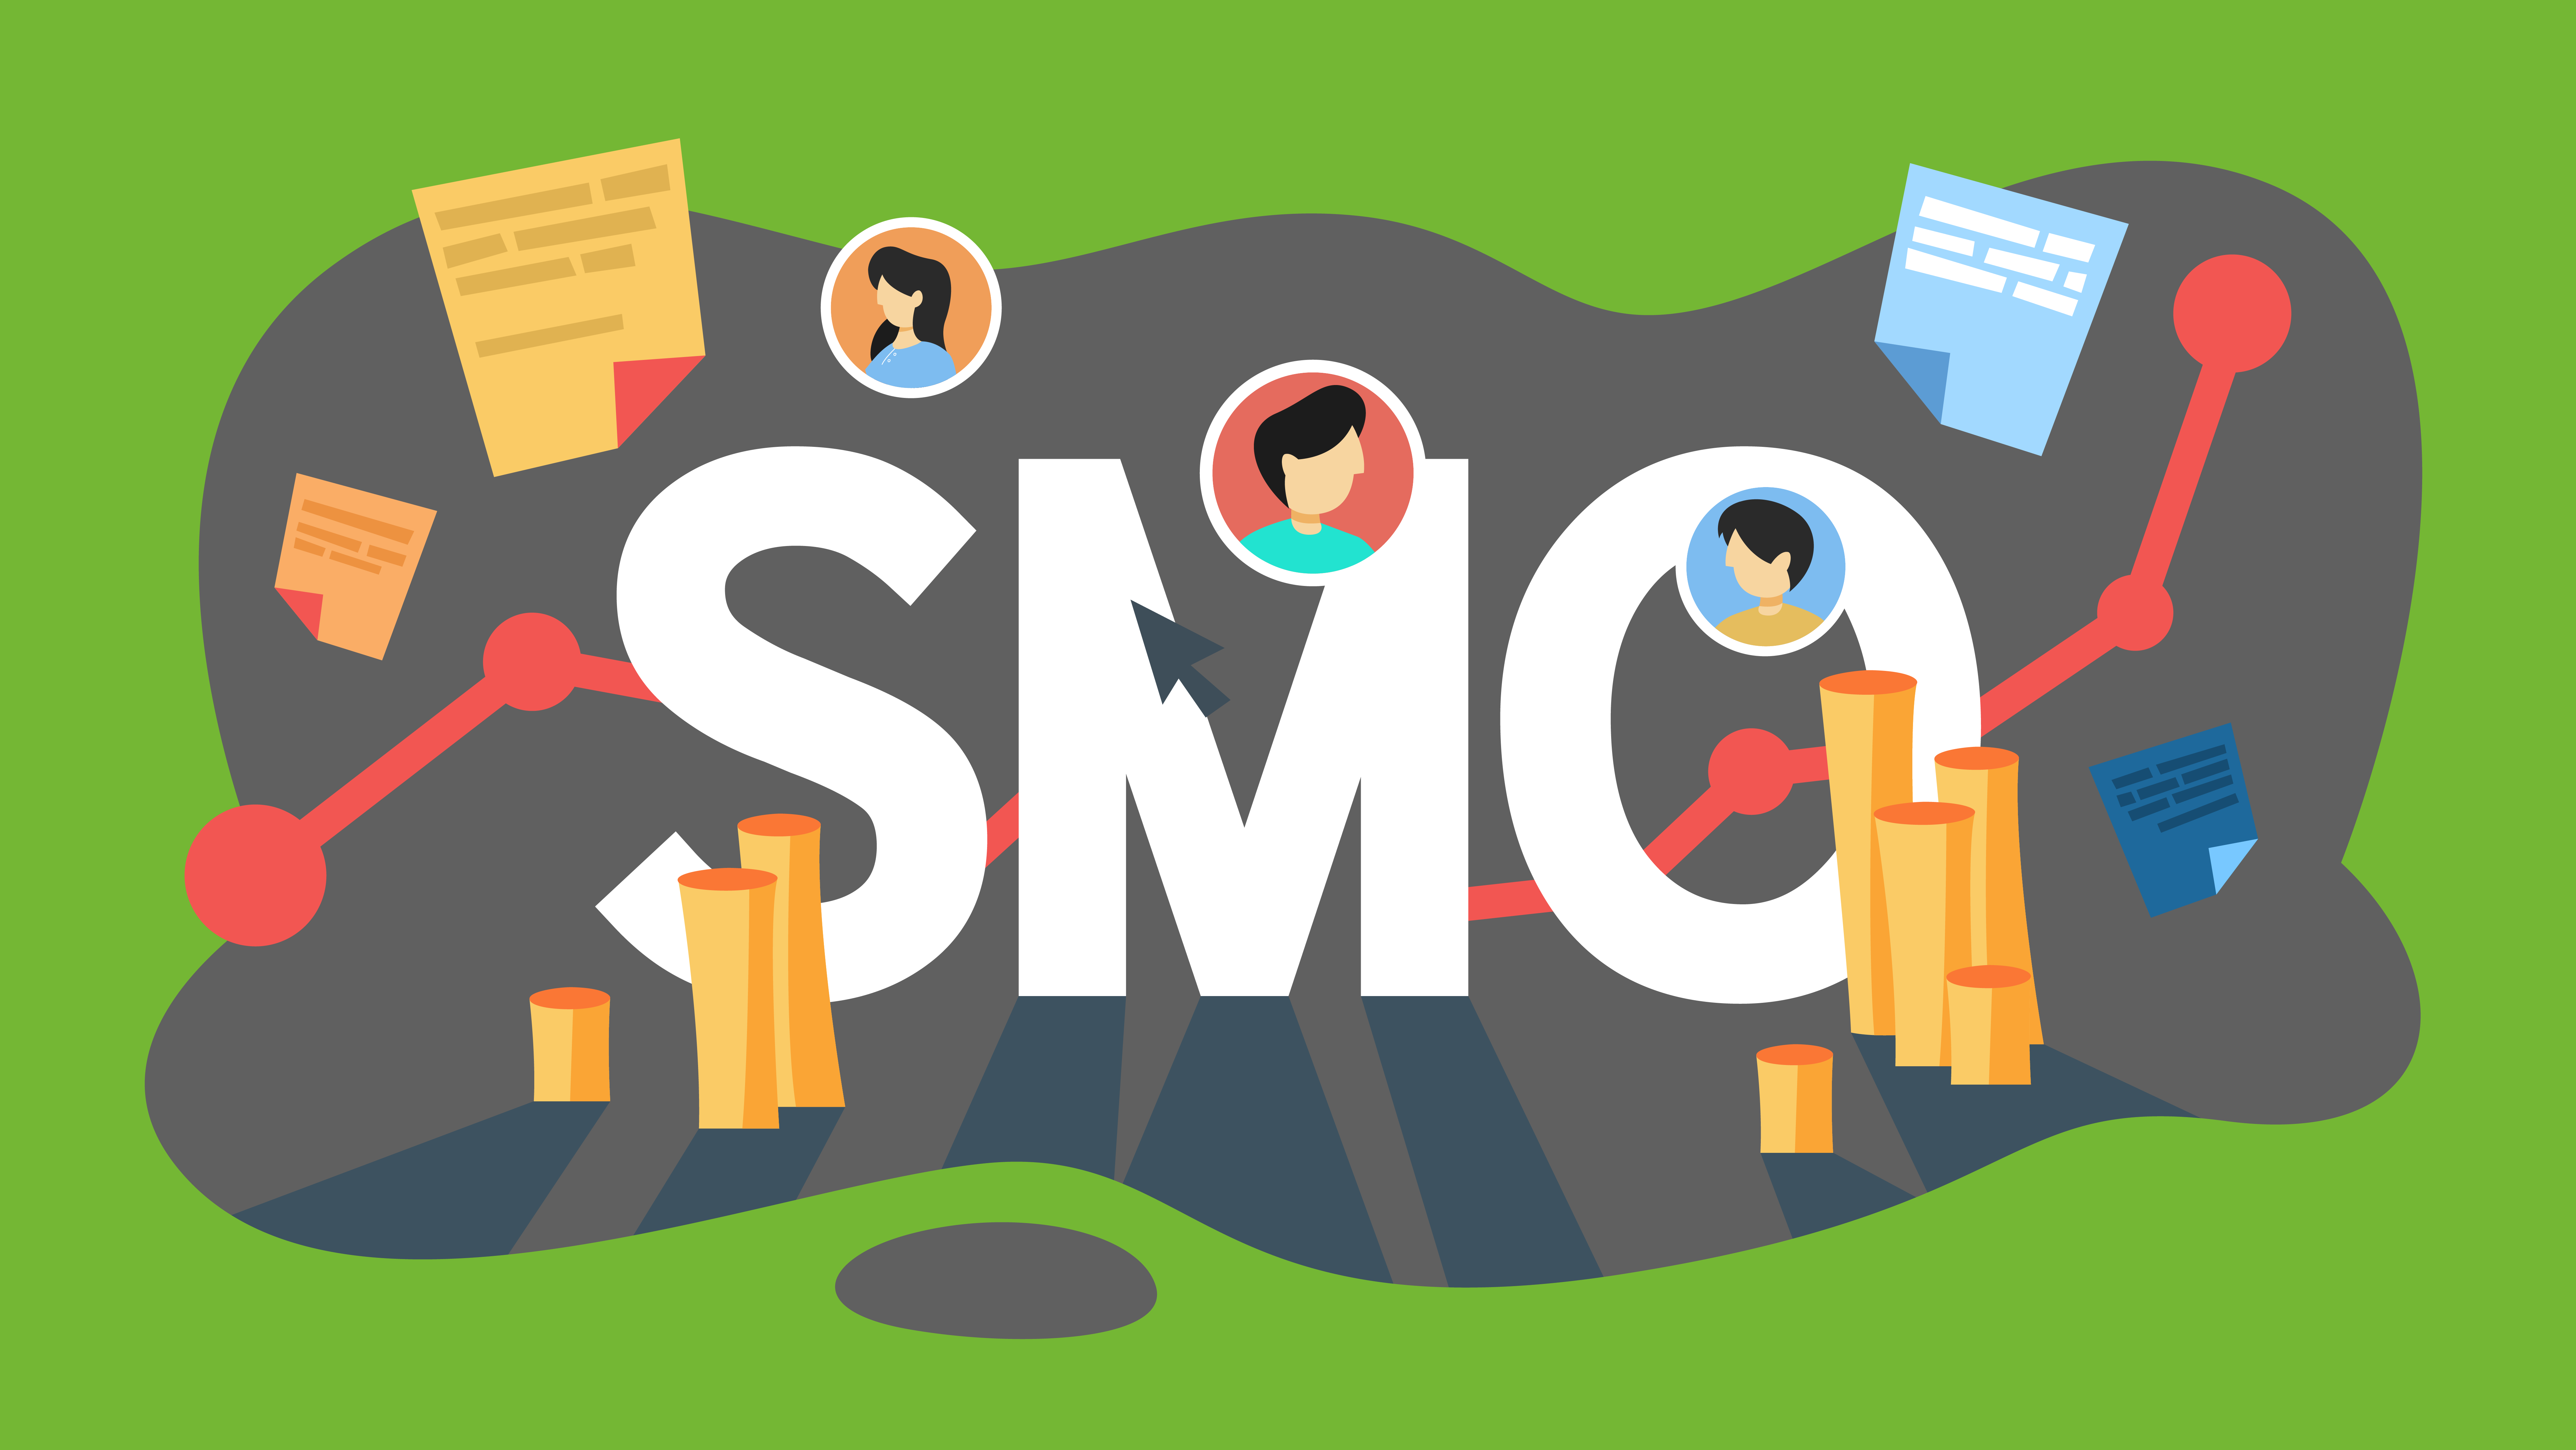 Illustration du concept de SMO ou Social Media Optimization